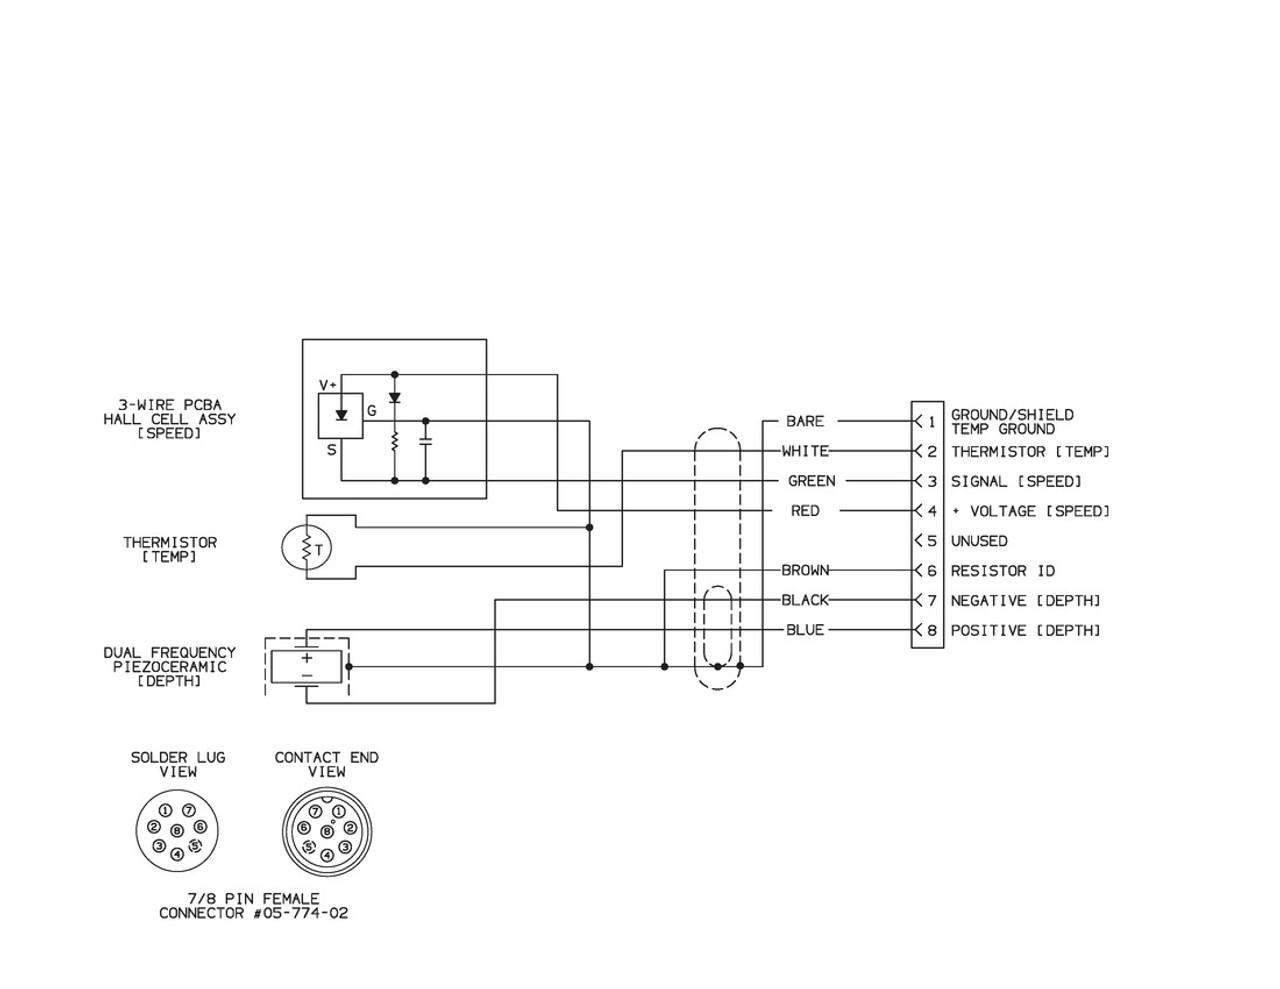 hight resolution of airmar wiring diagram garmin p66 600w s d t blue bottle marine